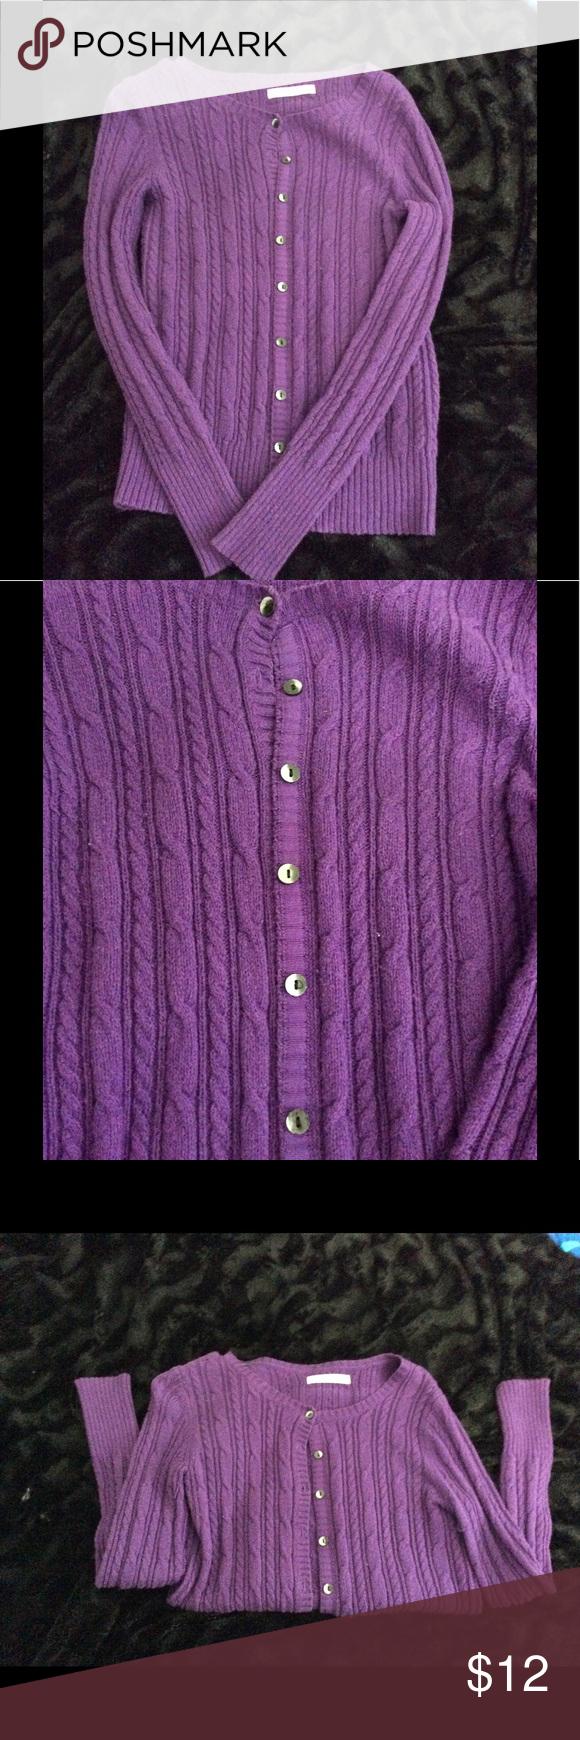 Old Navy Dark purple cardigan | Dark purple, Purple and Navy